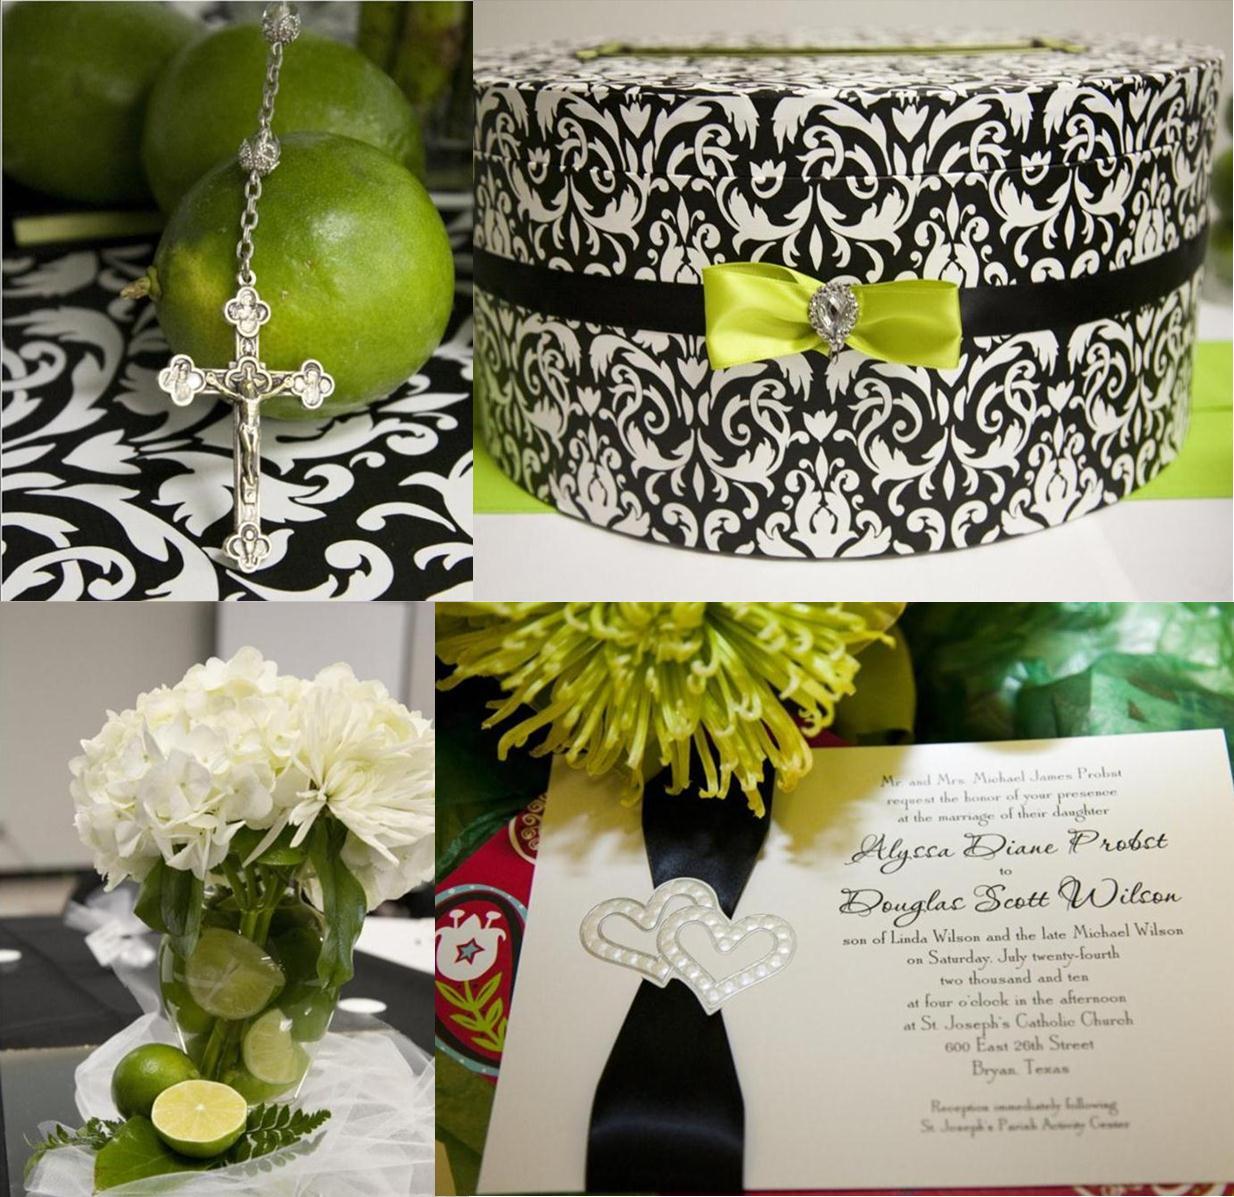 Lime Green Wedding Ideas: Kelsee's Blog: Lime Green Wedding Theme